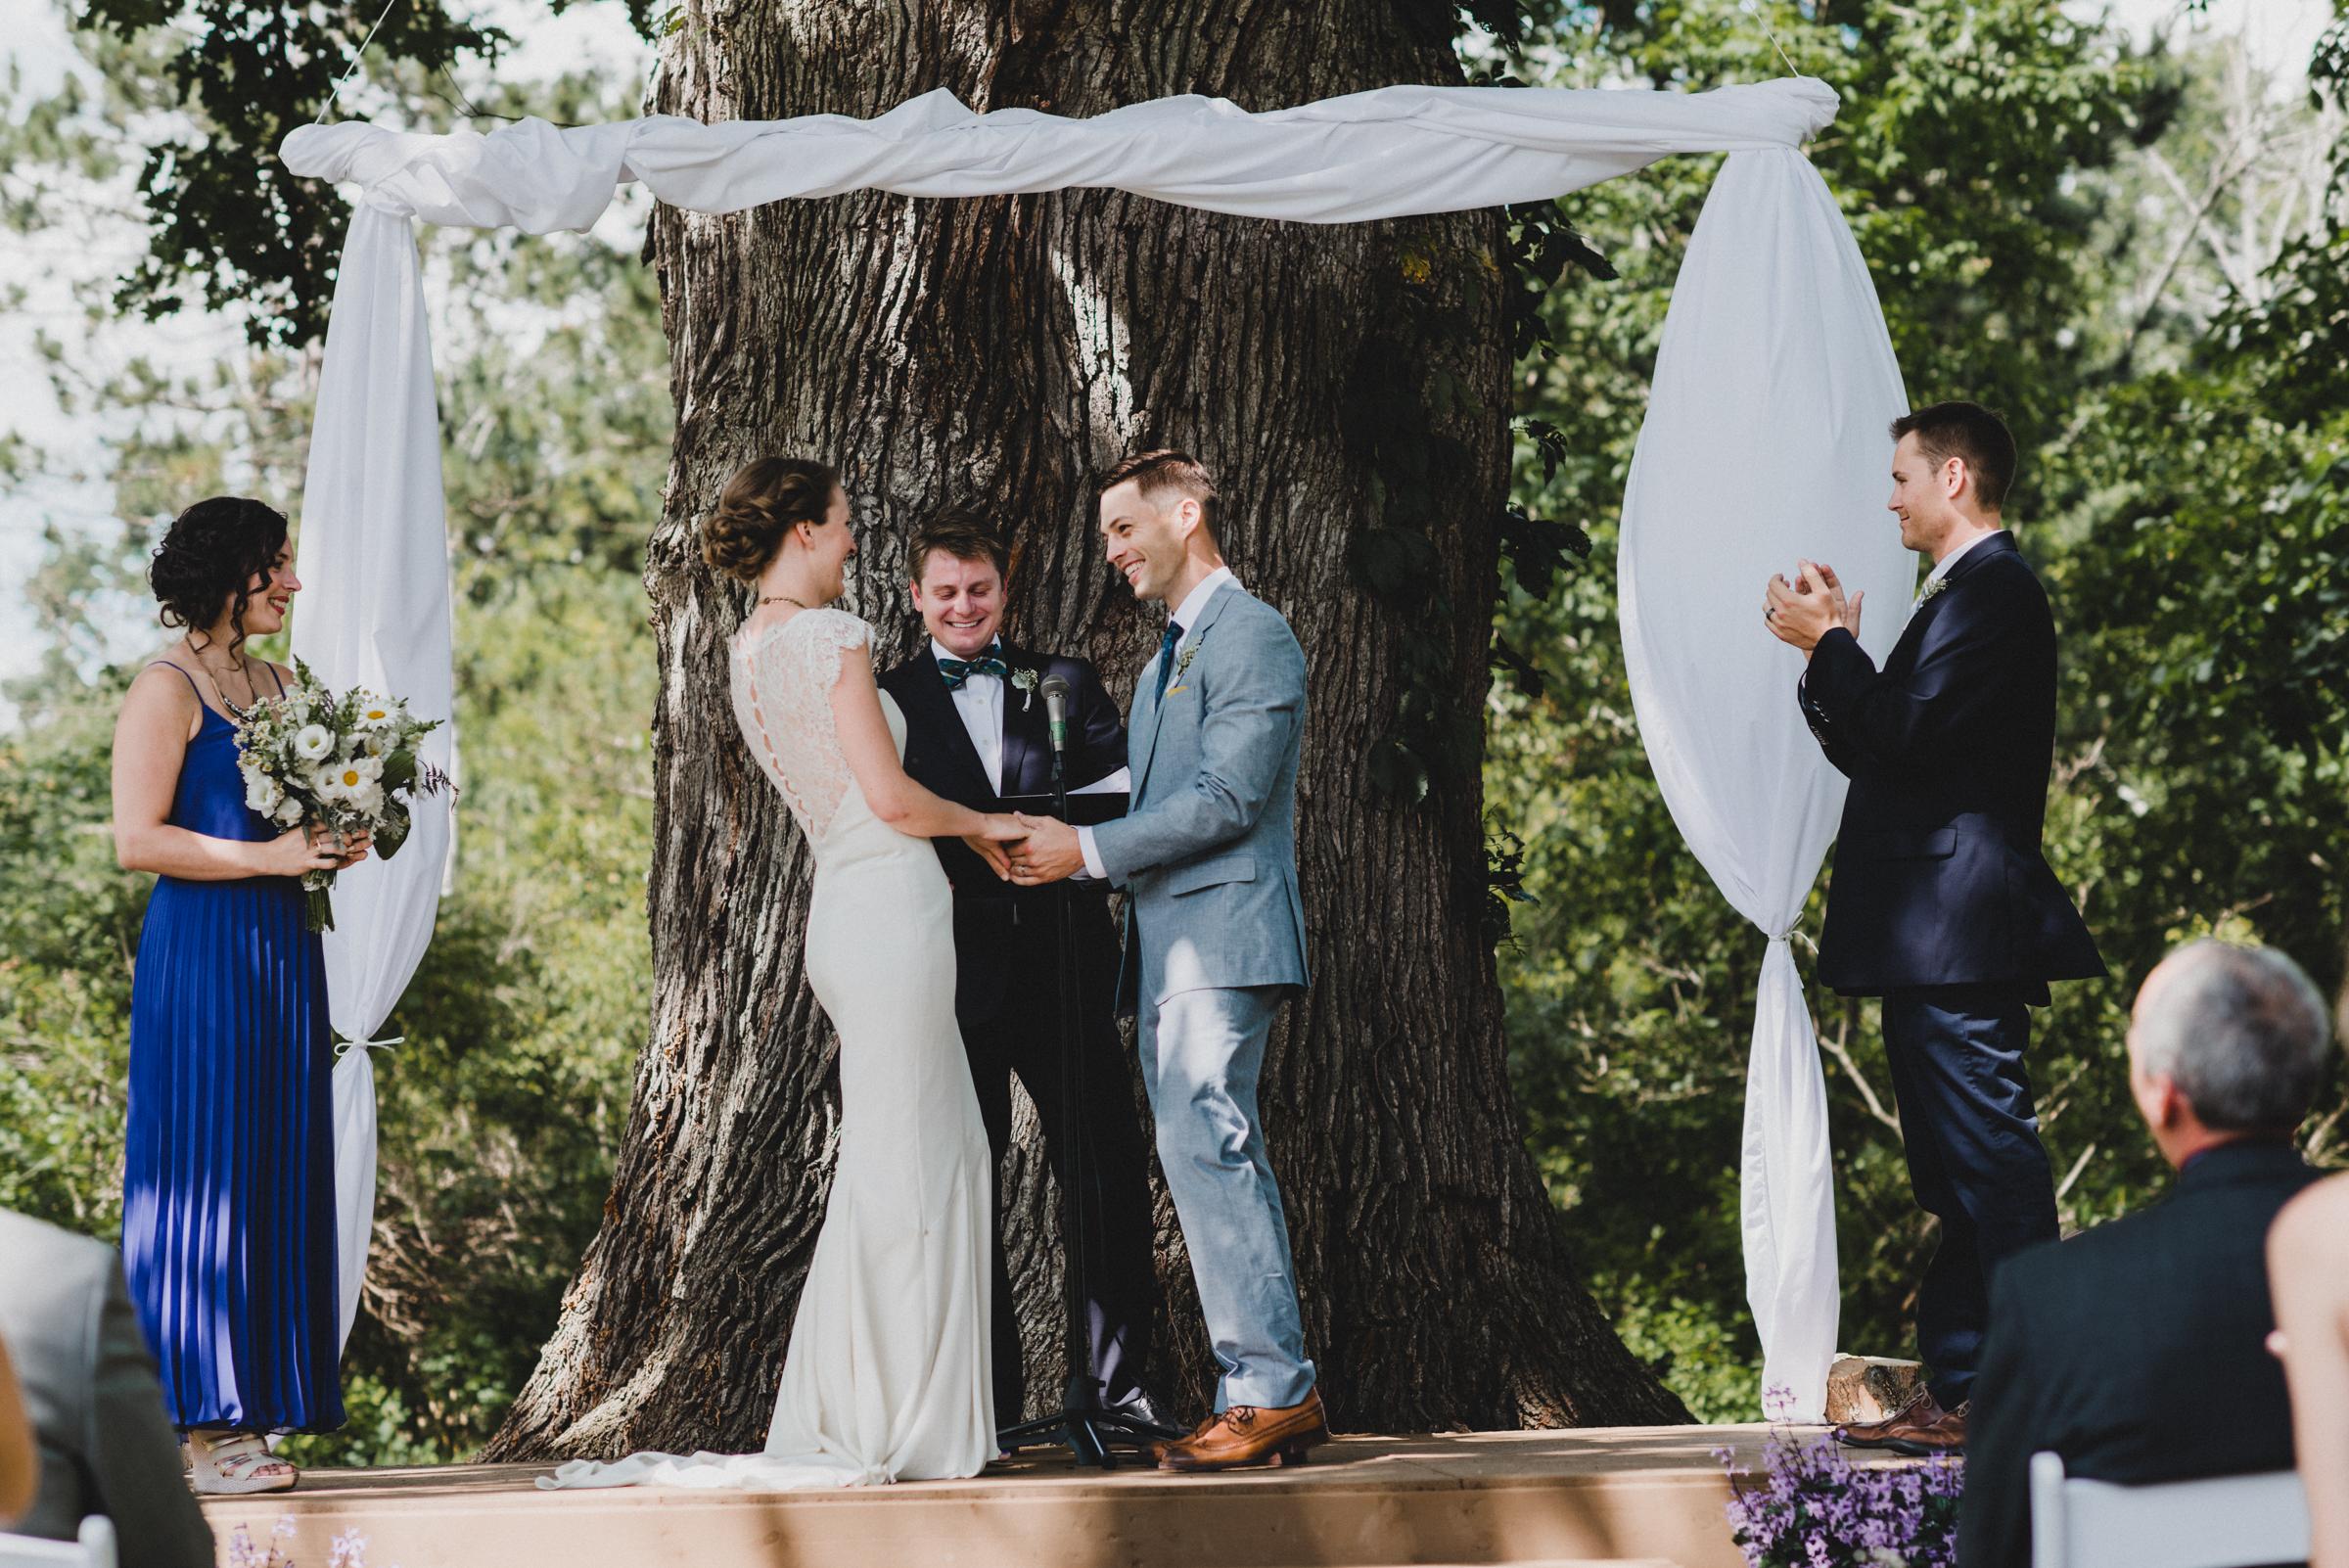 Intimate-Backyard-Farmhouse-Ohio-Wedding-Andi+Ben_Mallory+Justin-Photographers-167.JPG